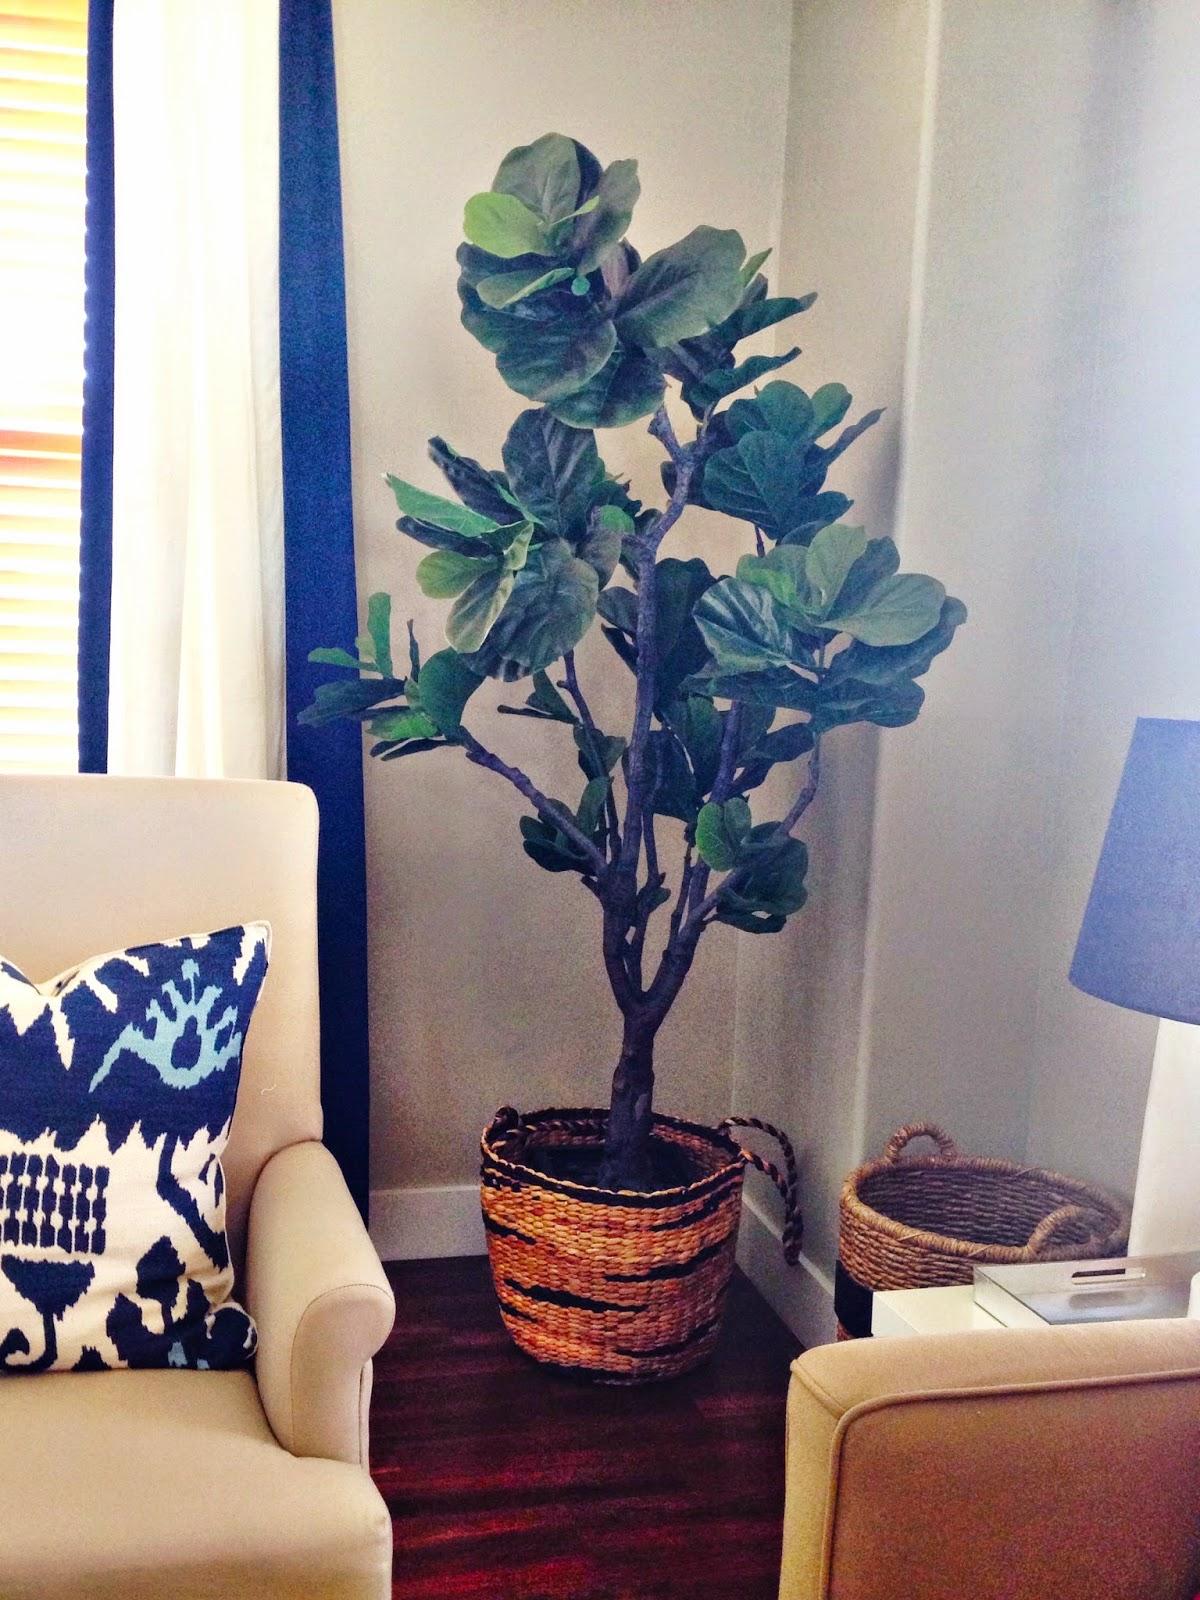 faux fiddle leaf fig trees   6th street design school   bloglovin'